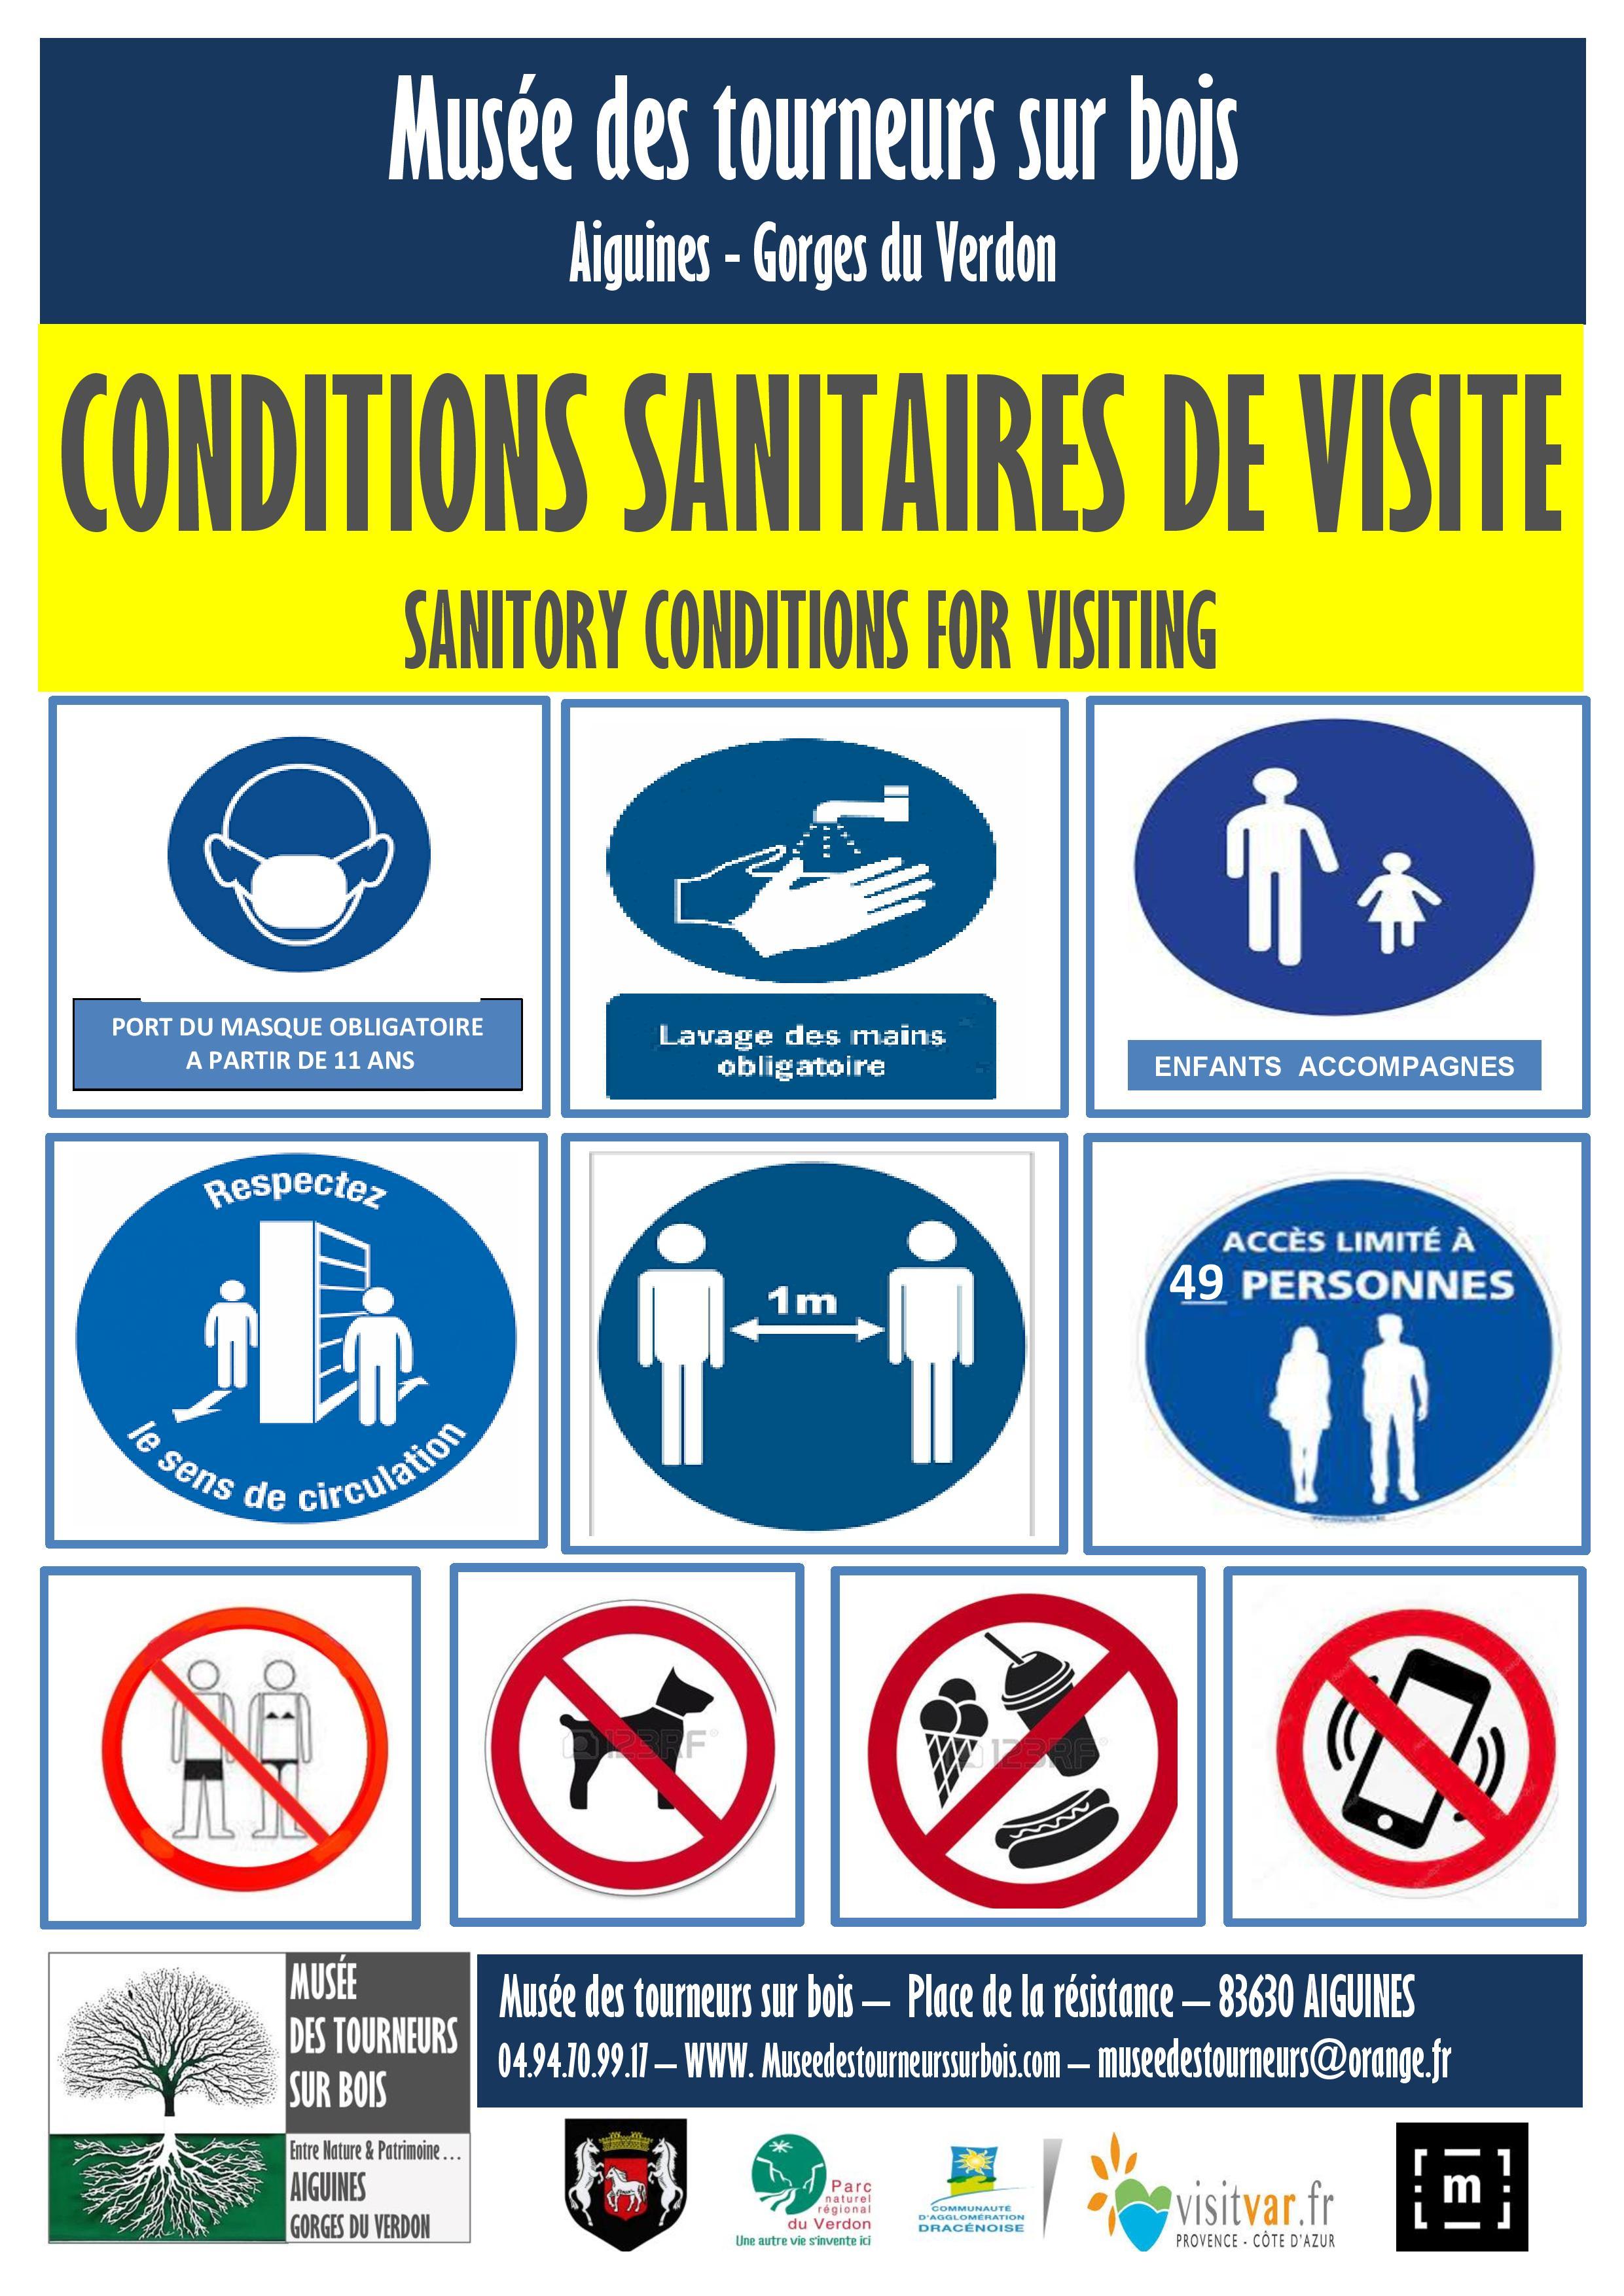 231 CONDITIONS SANITAIRE DE VISITE 2021 - Copie-page-001